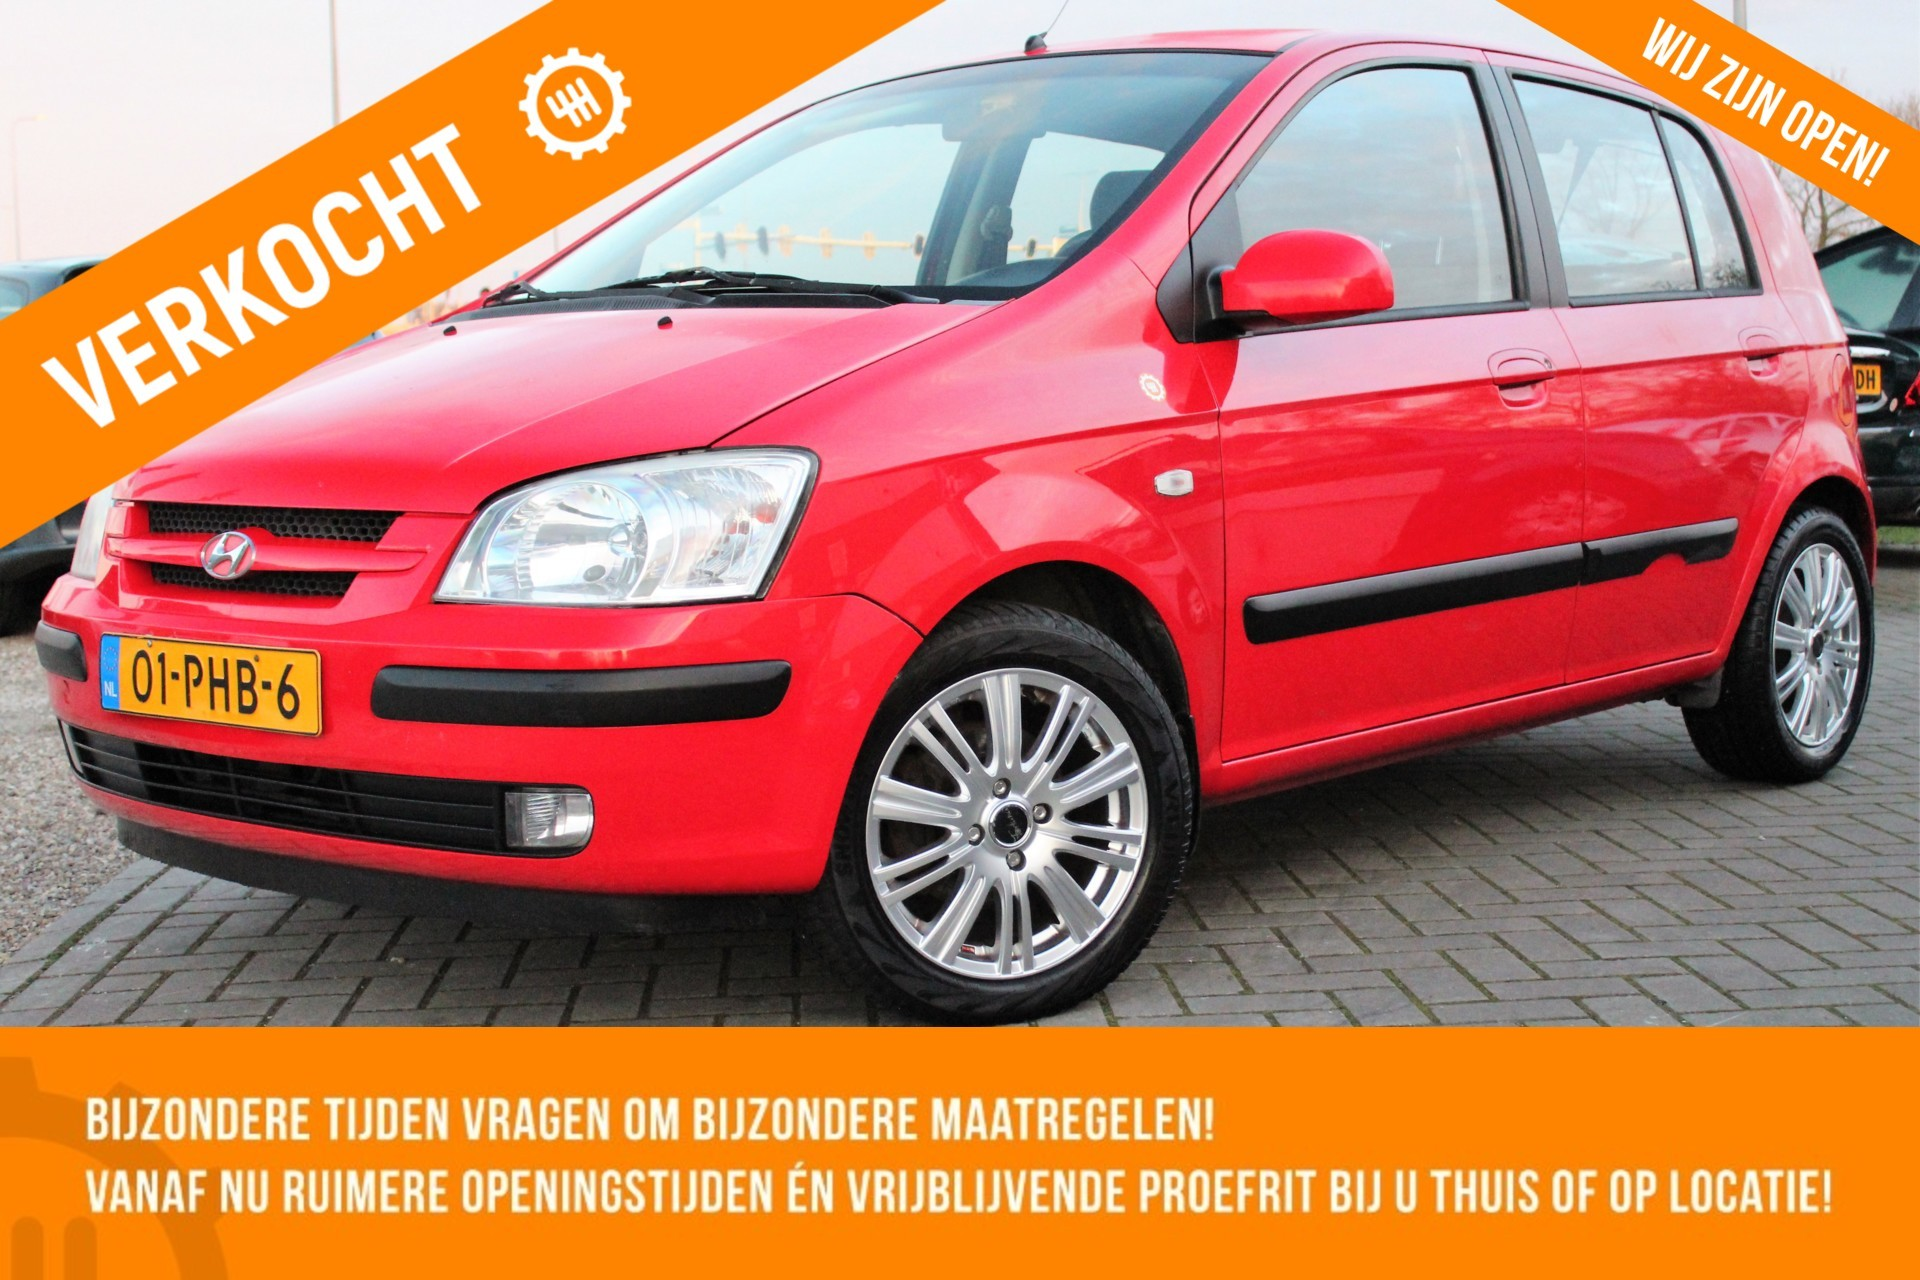 Caroutlet Groningen - Hyundai Getz 1.3i Active | 5 DEURS | TREKHAAK | ELEK PAKKET